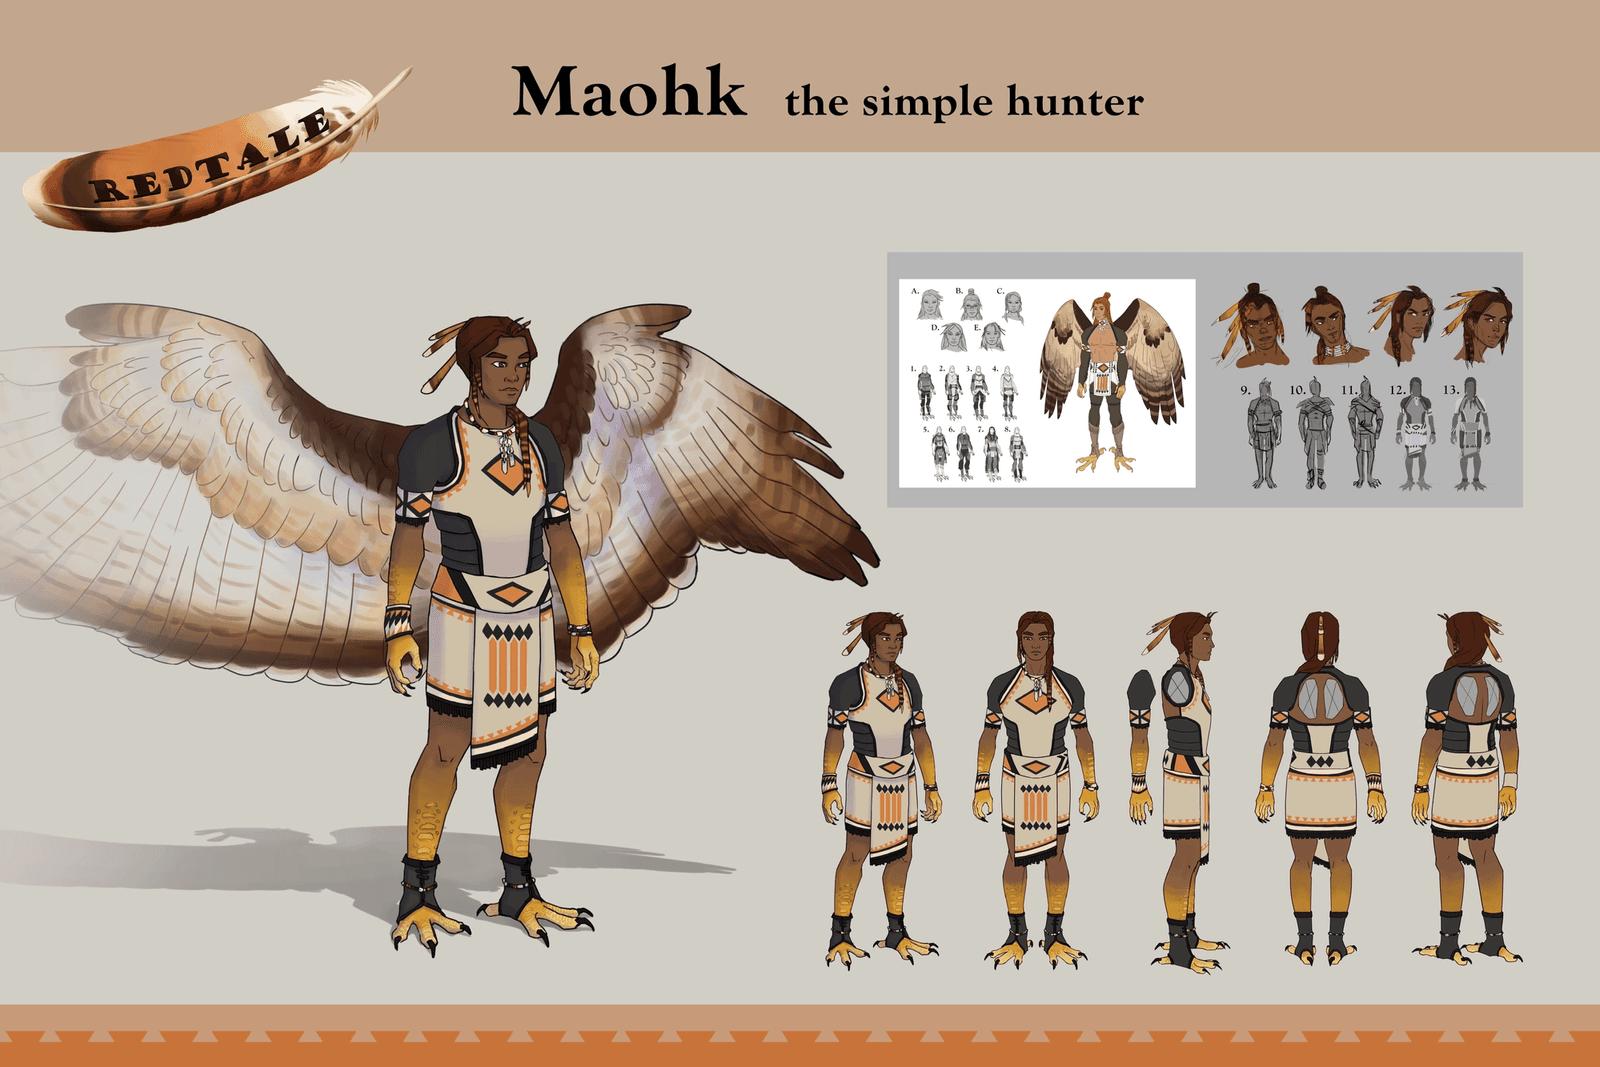 Maohk